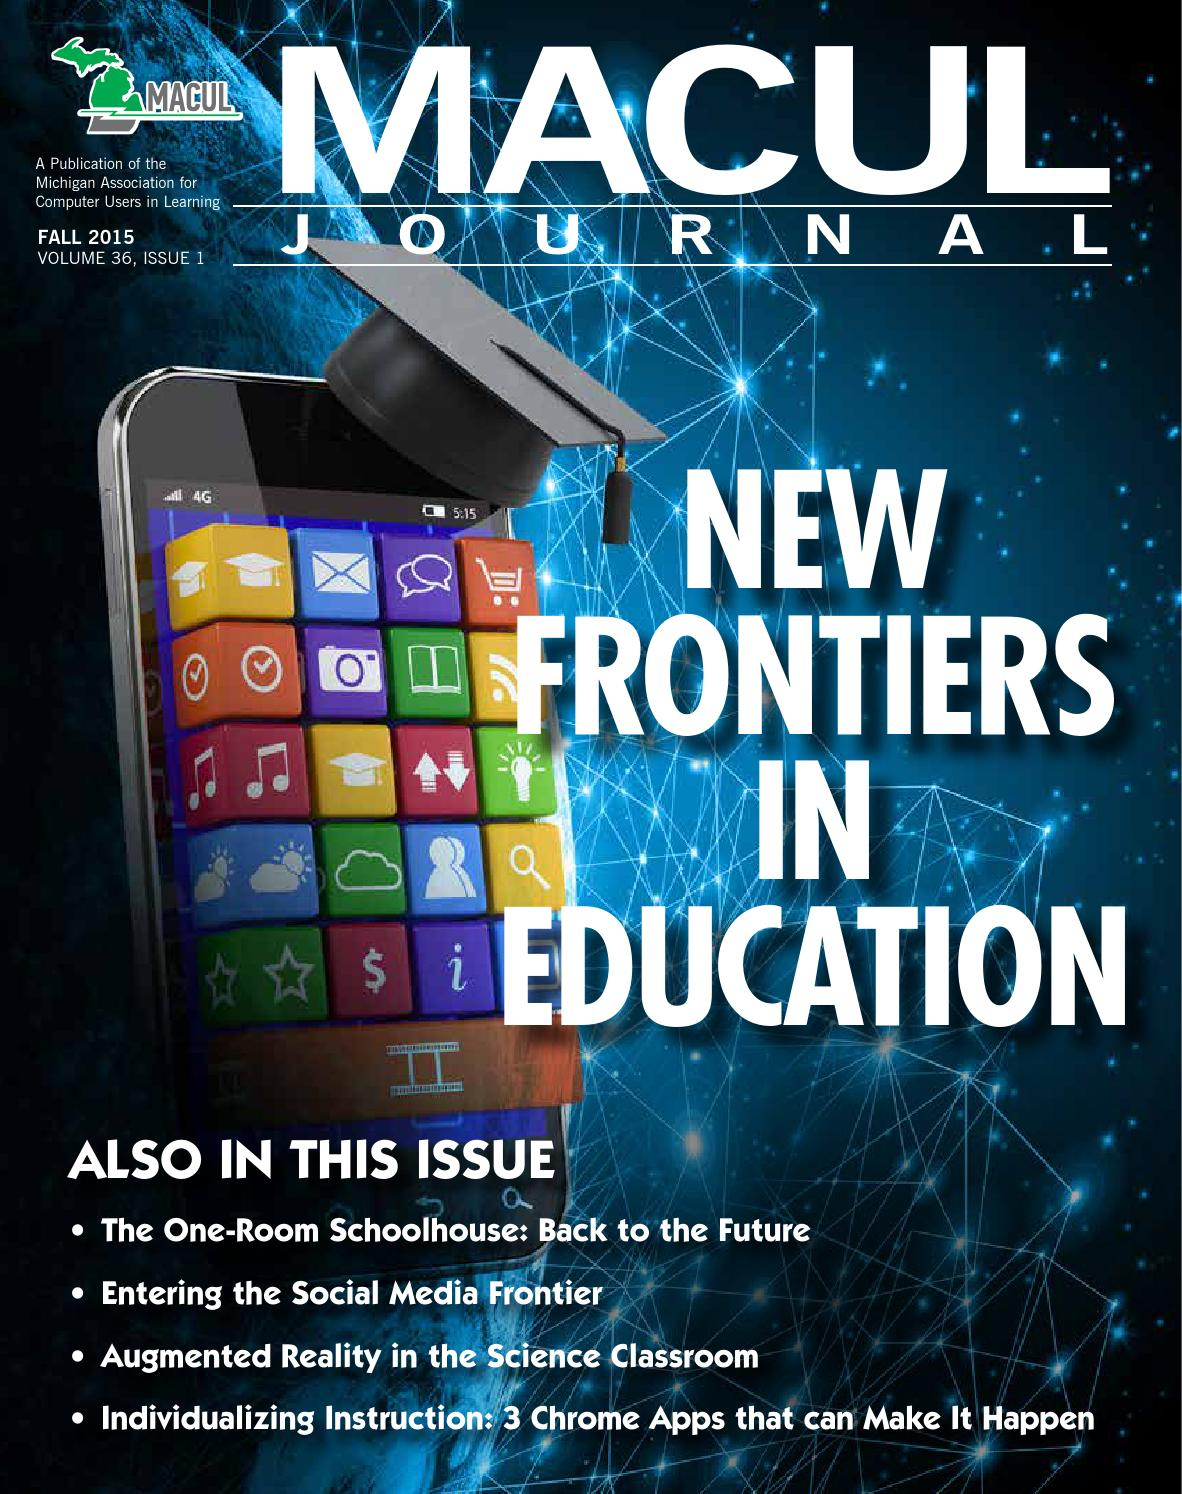 MACUL Journal Fall 2015 by MACUL - issuu